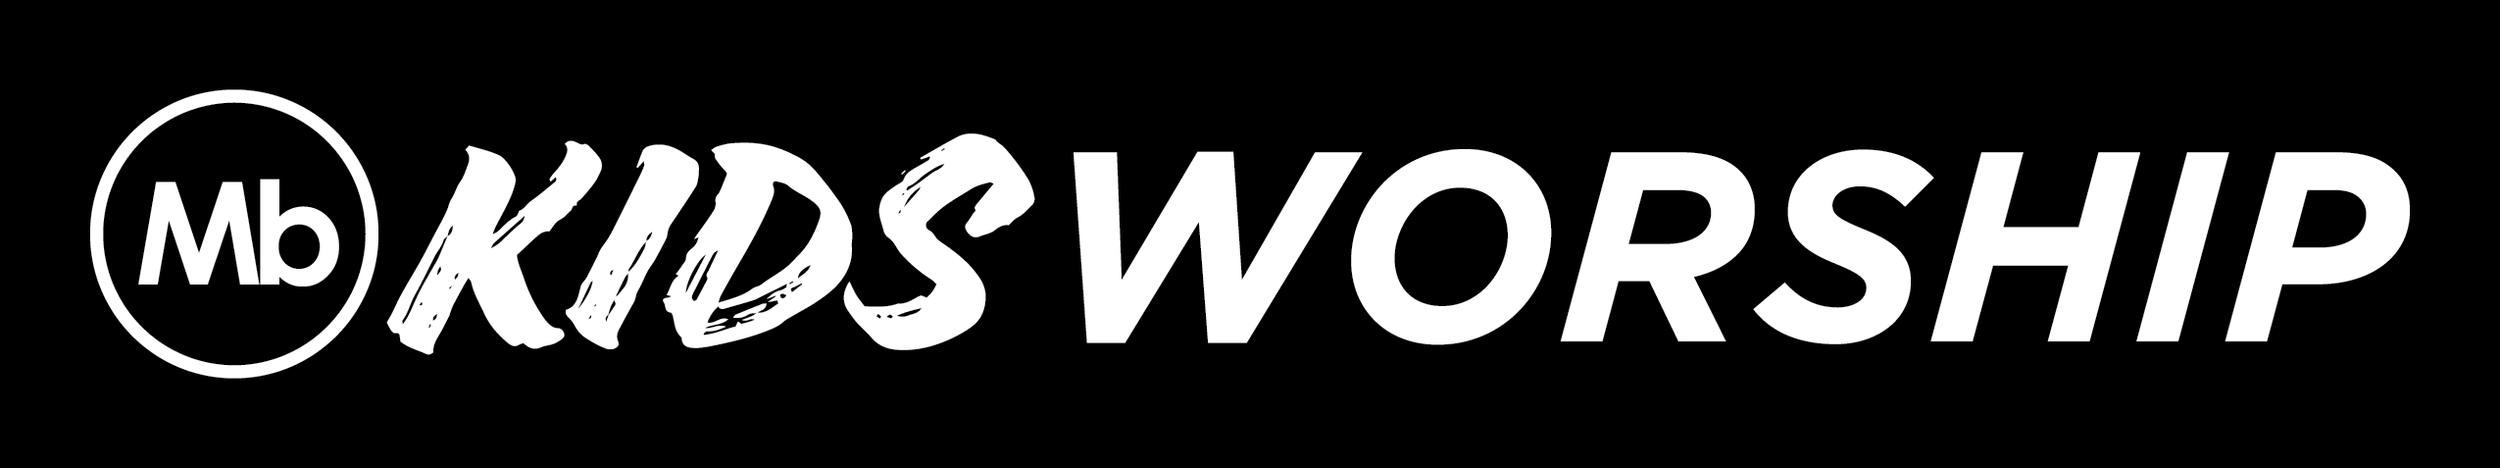 MbKidsWorship_Logo_Reversed-01.png